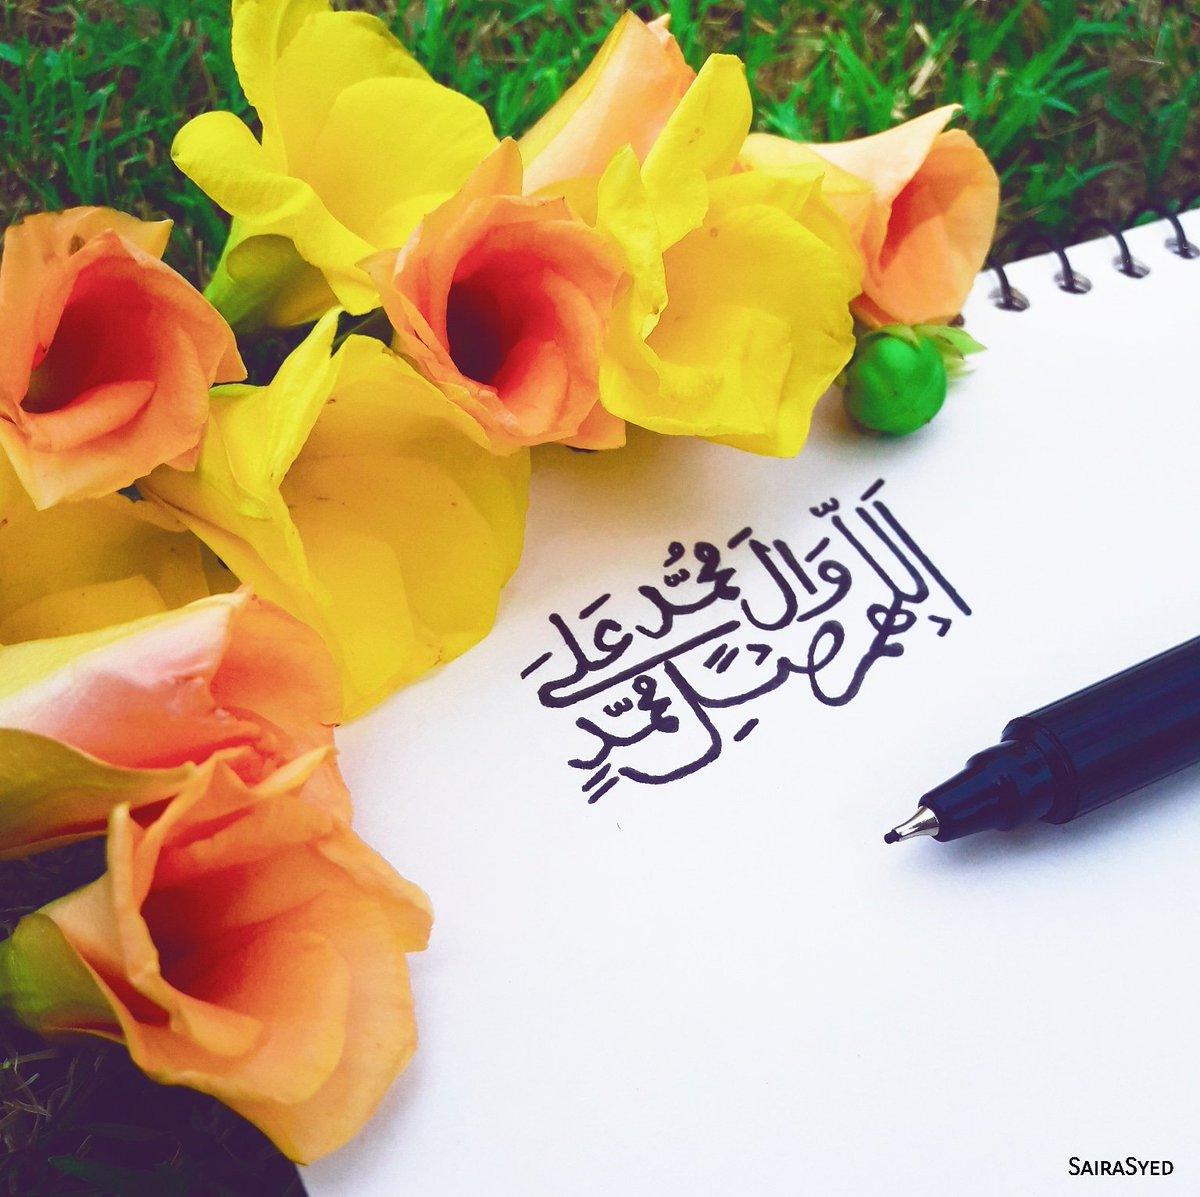 Salawat Photos And Hastag Crypto Coin Tags Trend Topic Dogecoin Eceran Saira Syed Artxpert On Fridays Send Abundantly Prophet Muhammad His Ahl 39ul 39baiyt Sairasyed Calligraphy Shiaart